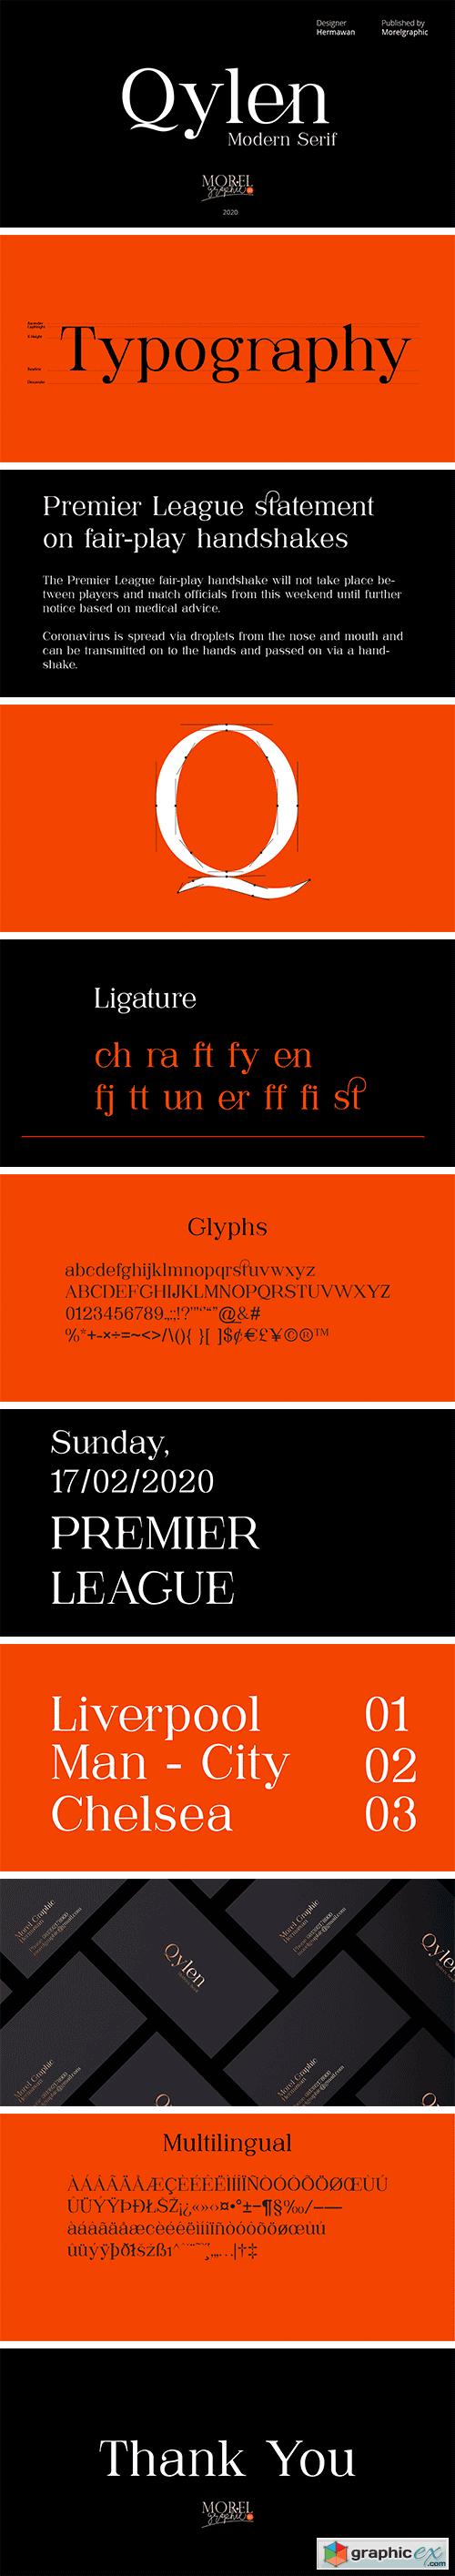 Qylen Typeface